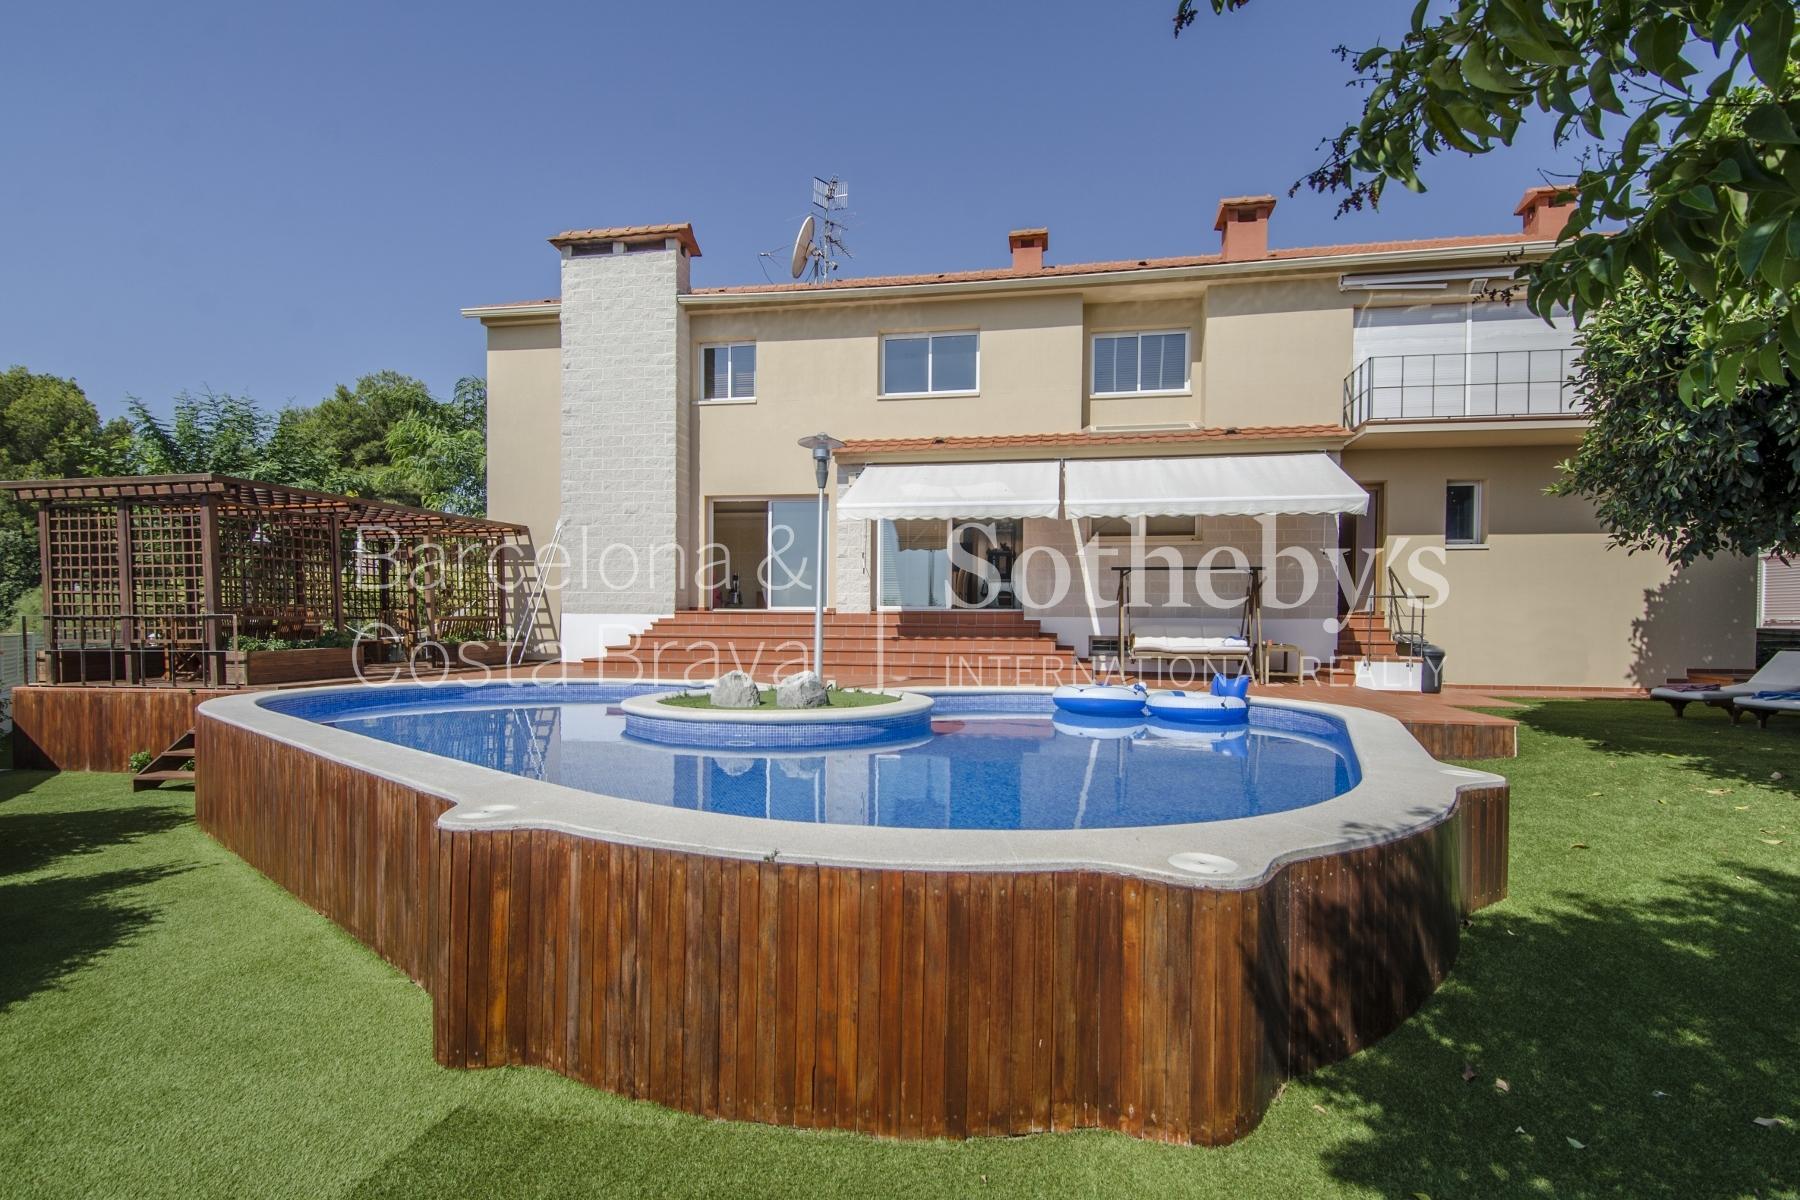 Single Family Home for Sale at Modern Designer House Situated in Santa Bárbara Sitges Sitges, Barcelona 08870 Spain